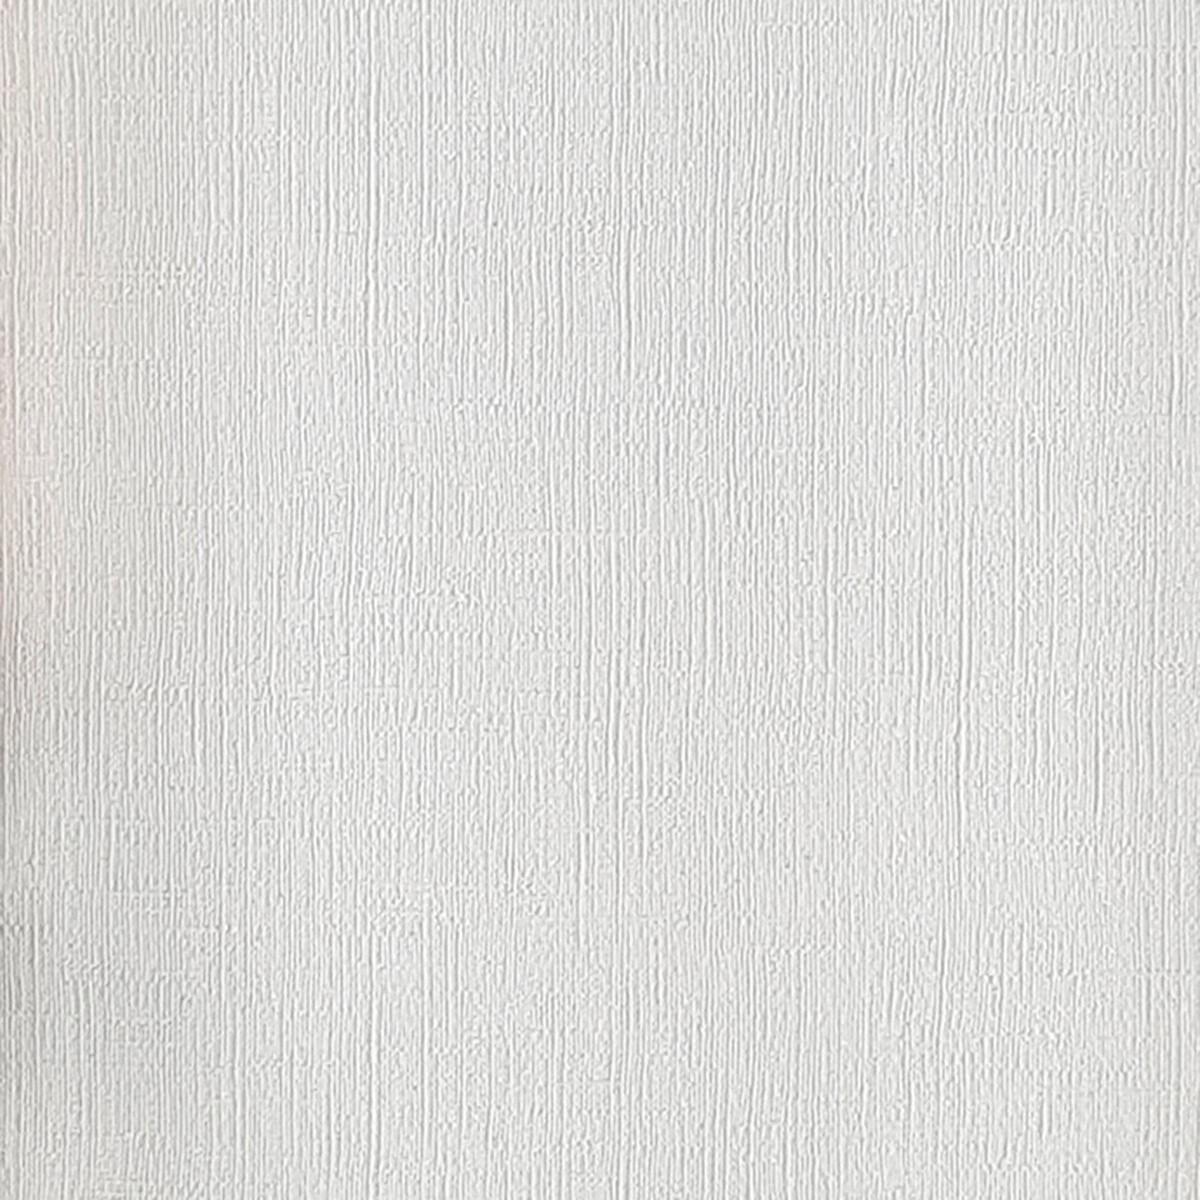 Обои флизелиновые G`Boya Fashion I белые 240488 1.06 м